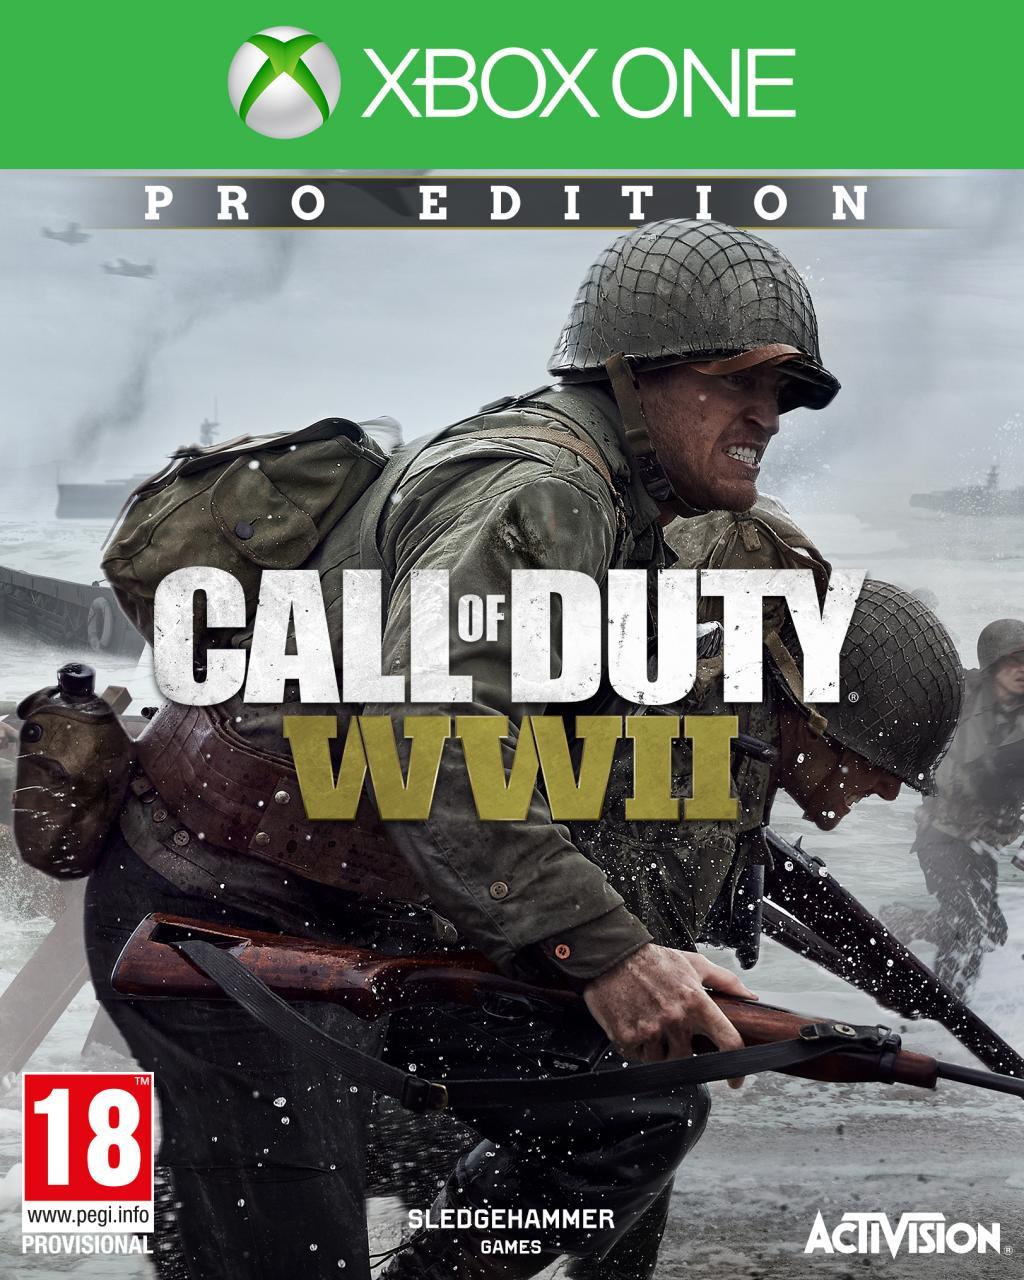 Call Of Duty World War II - PRO EDITION